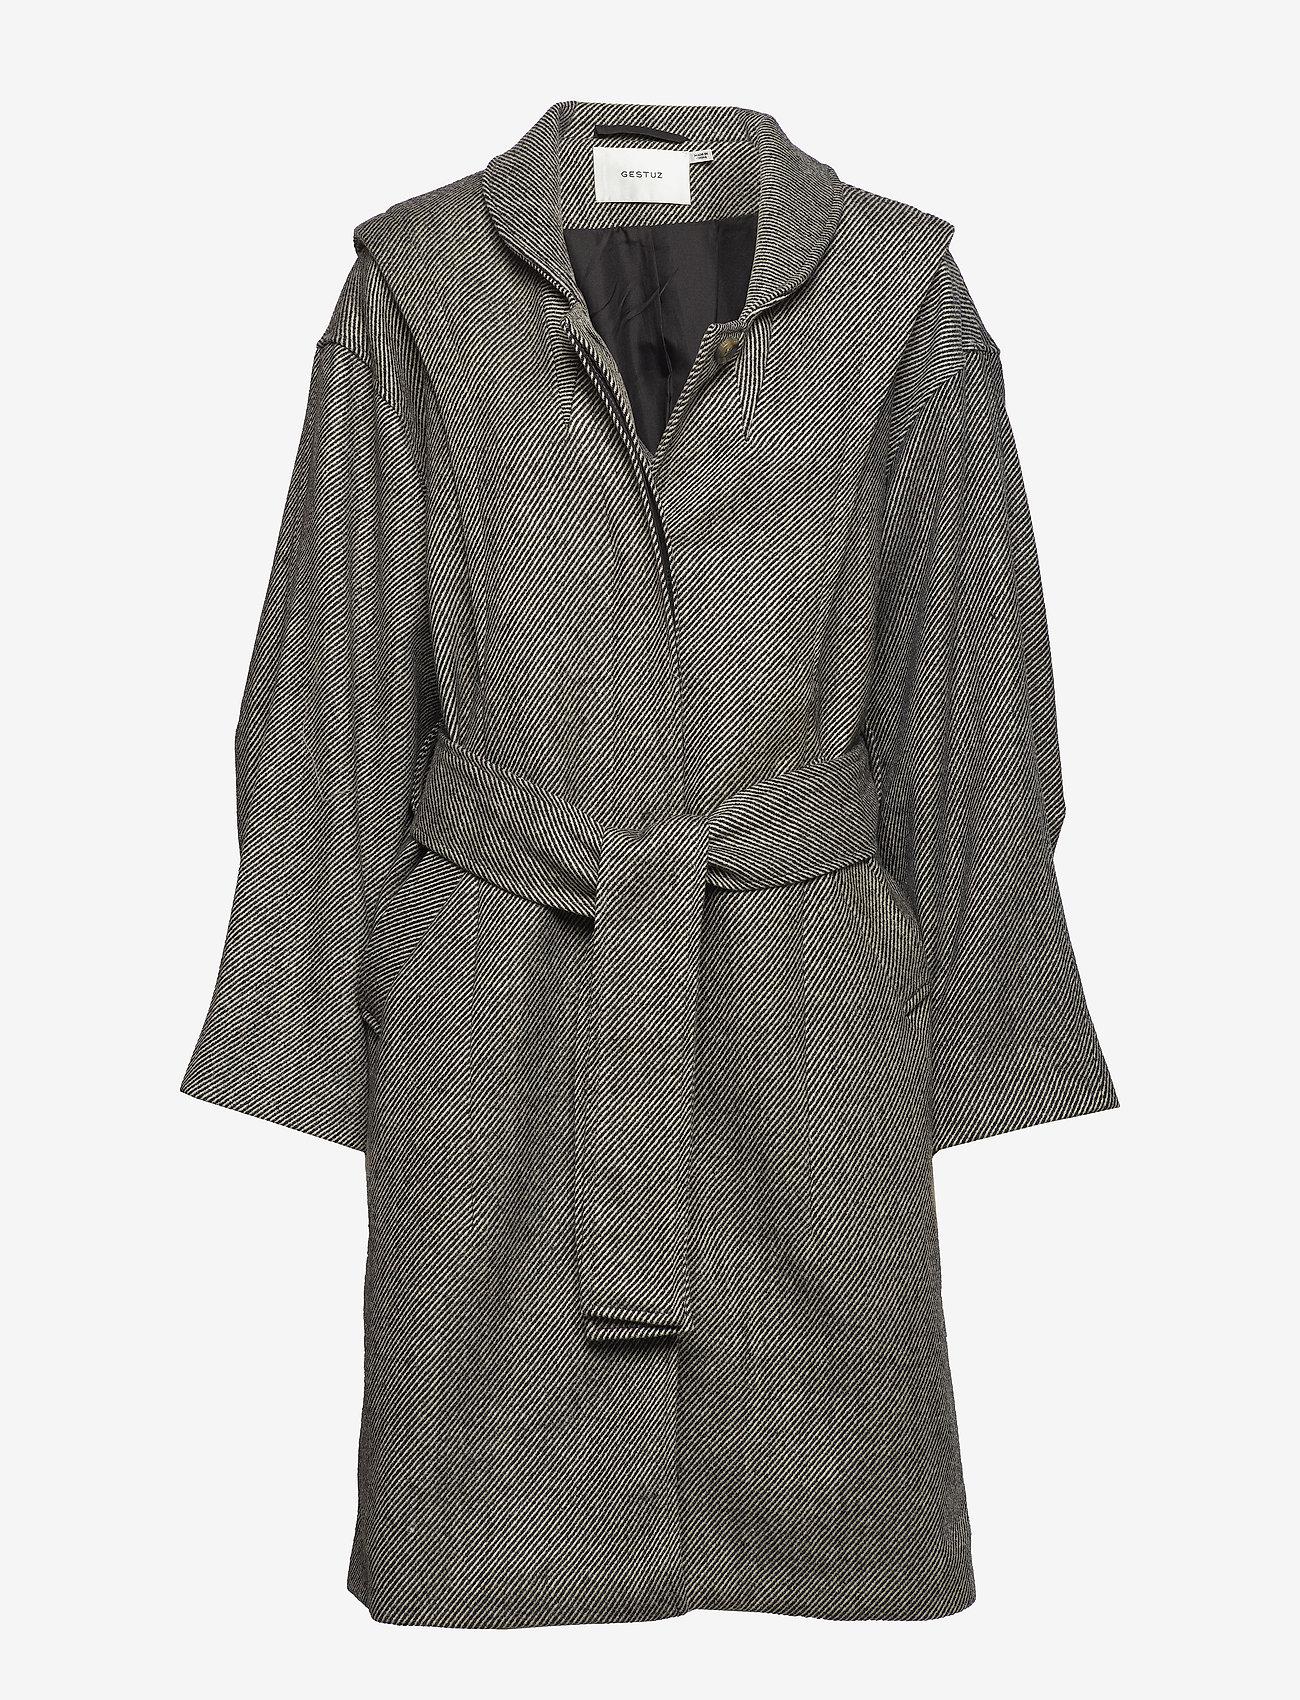 Wolla Coat Ze4 18 (Stripe As Sample) - Gestuz 8UThdF